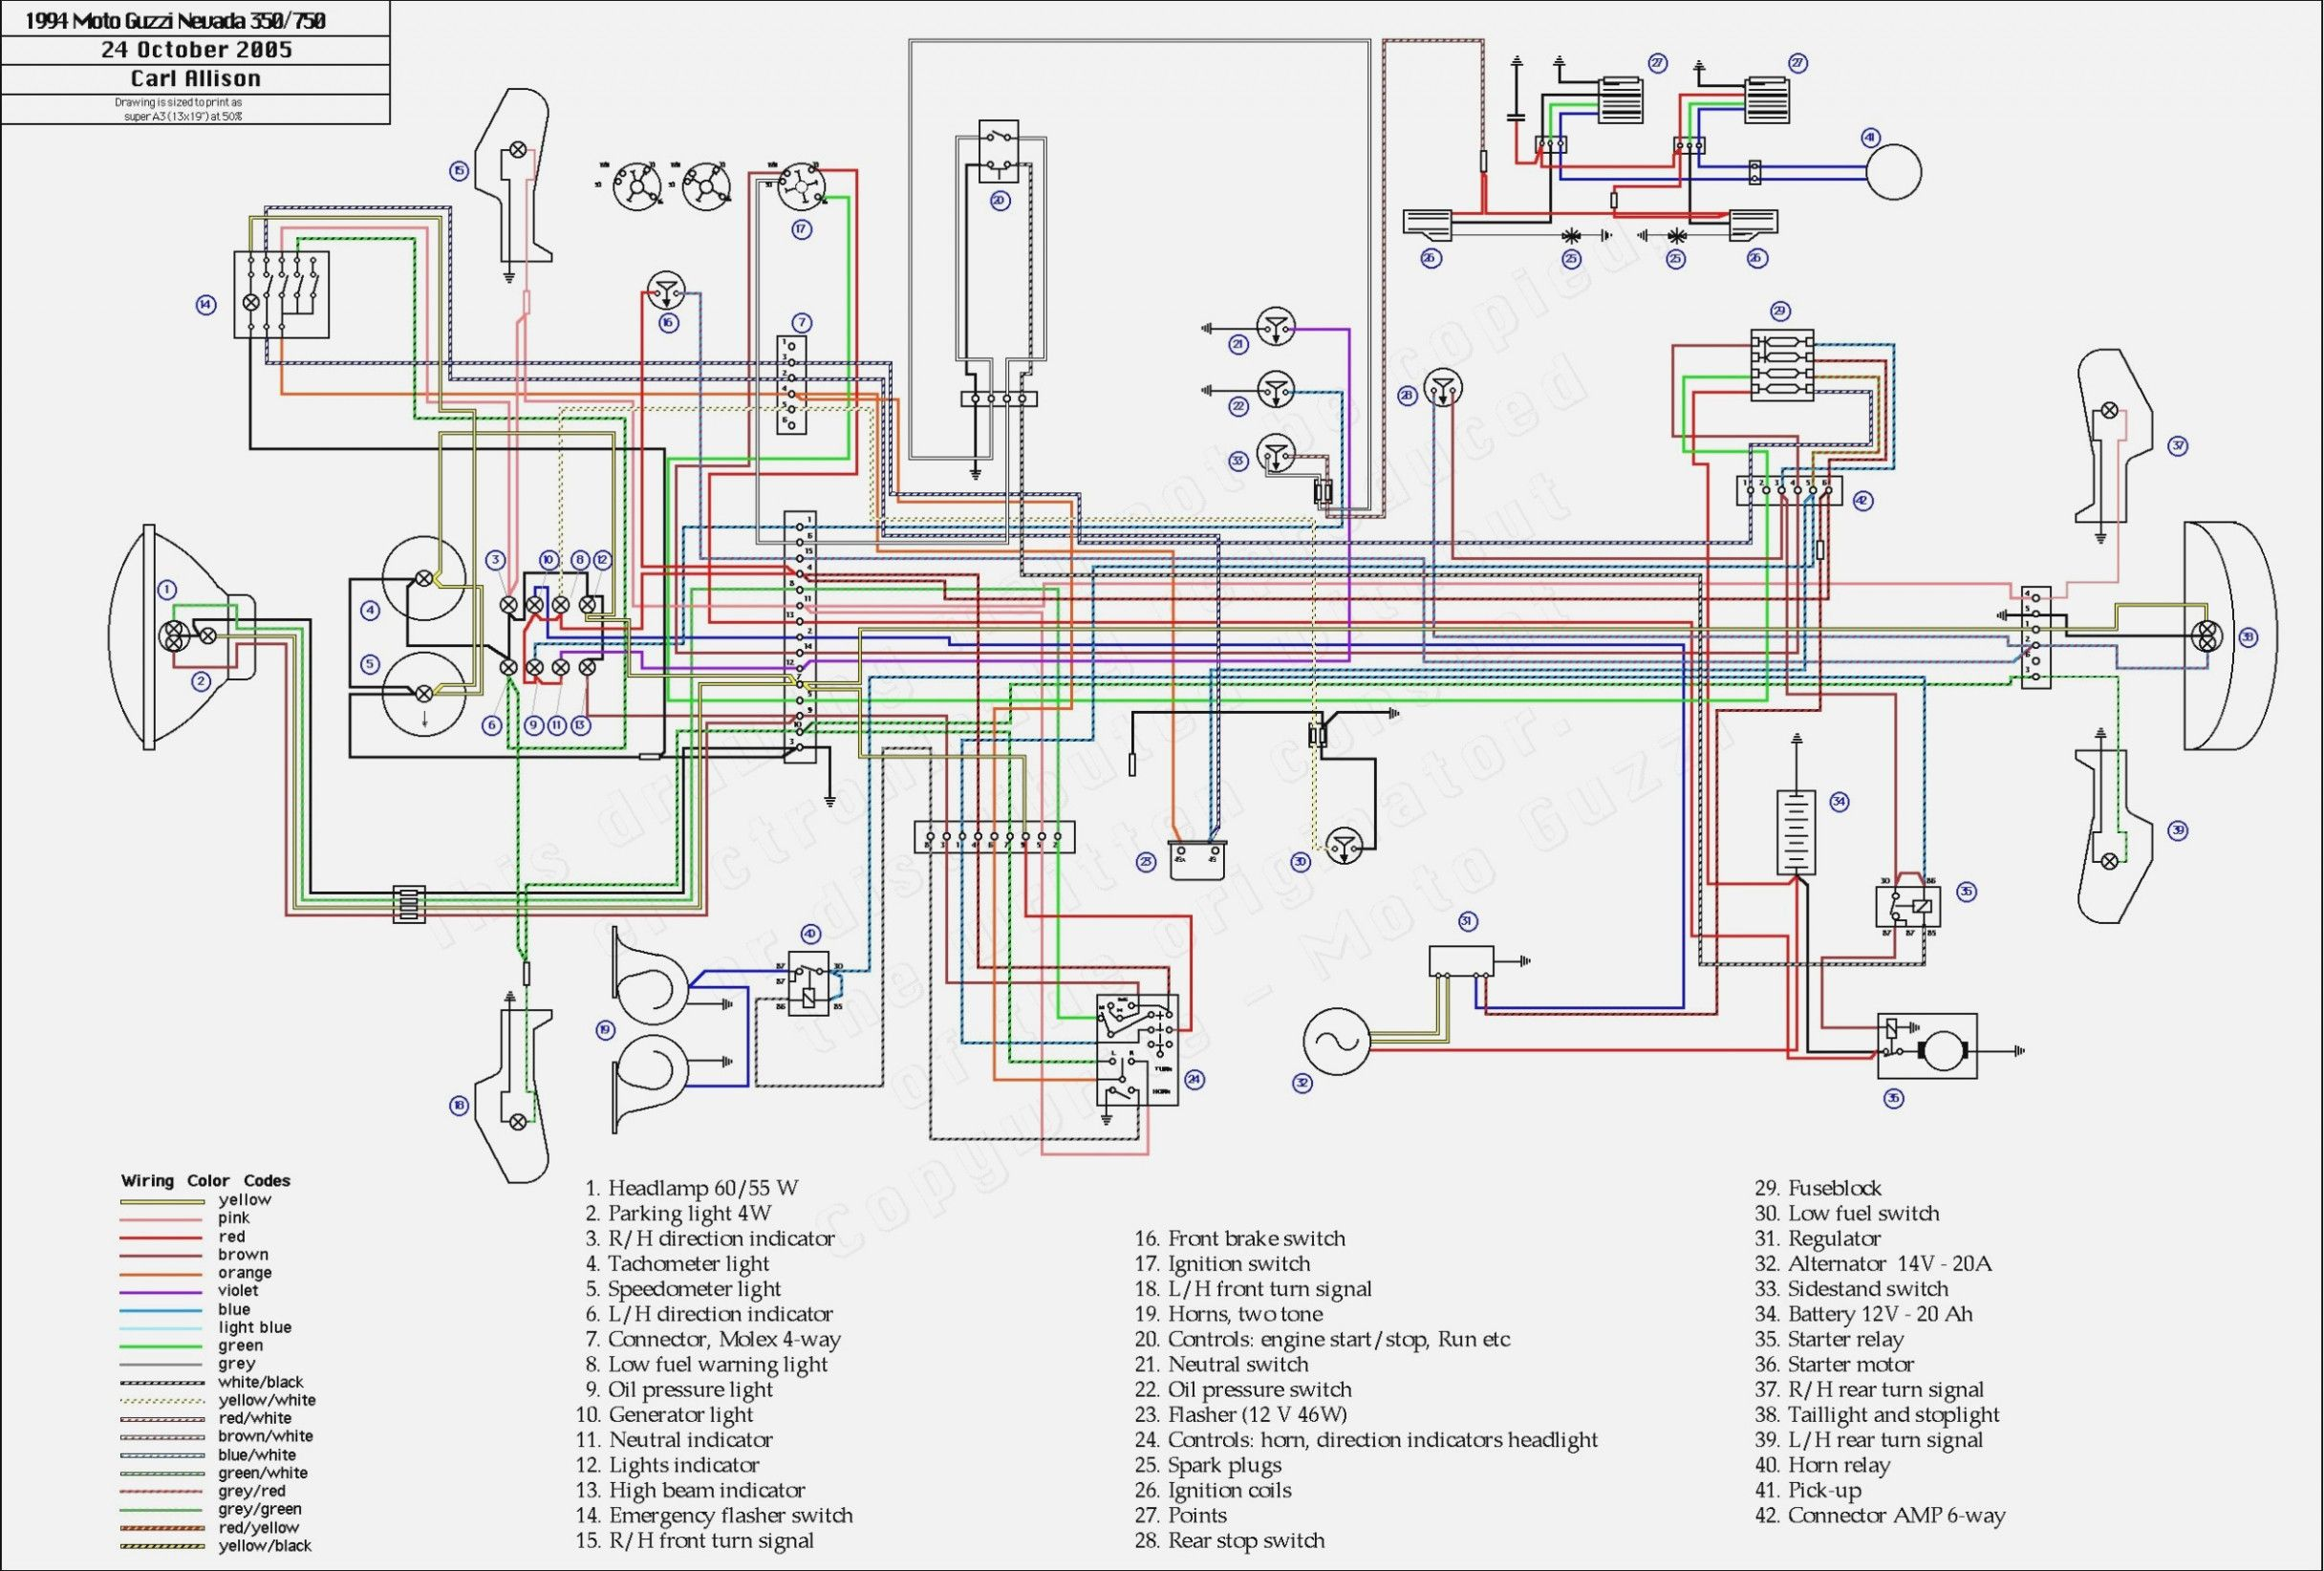 Yamaha Jog Engine Diagram Electrical Diagram Electrical Wiring Diagram Diagram